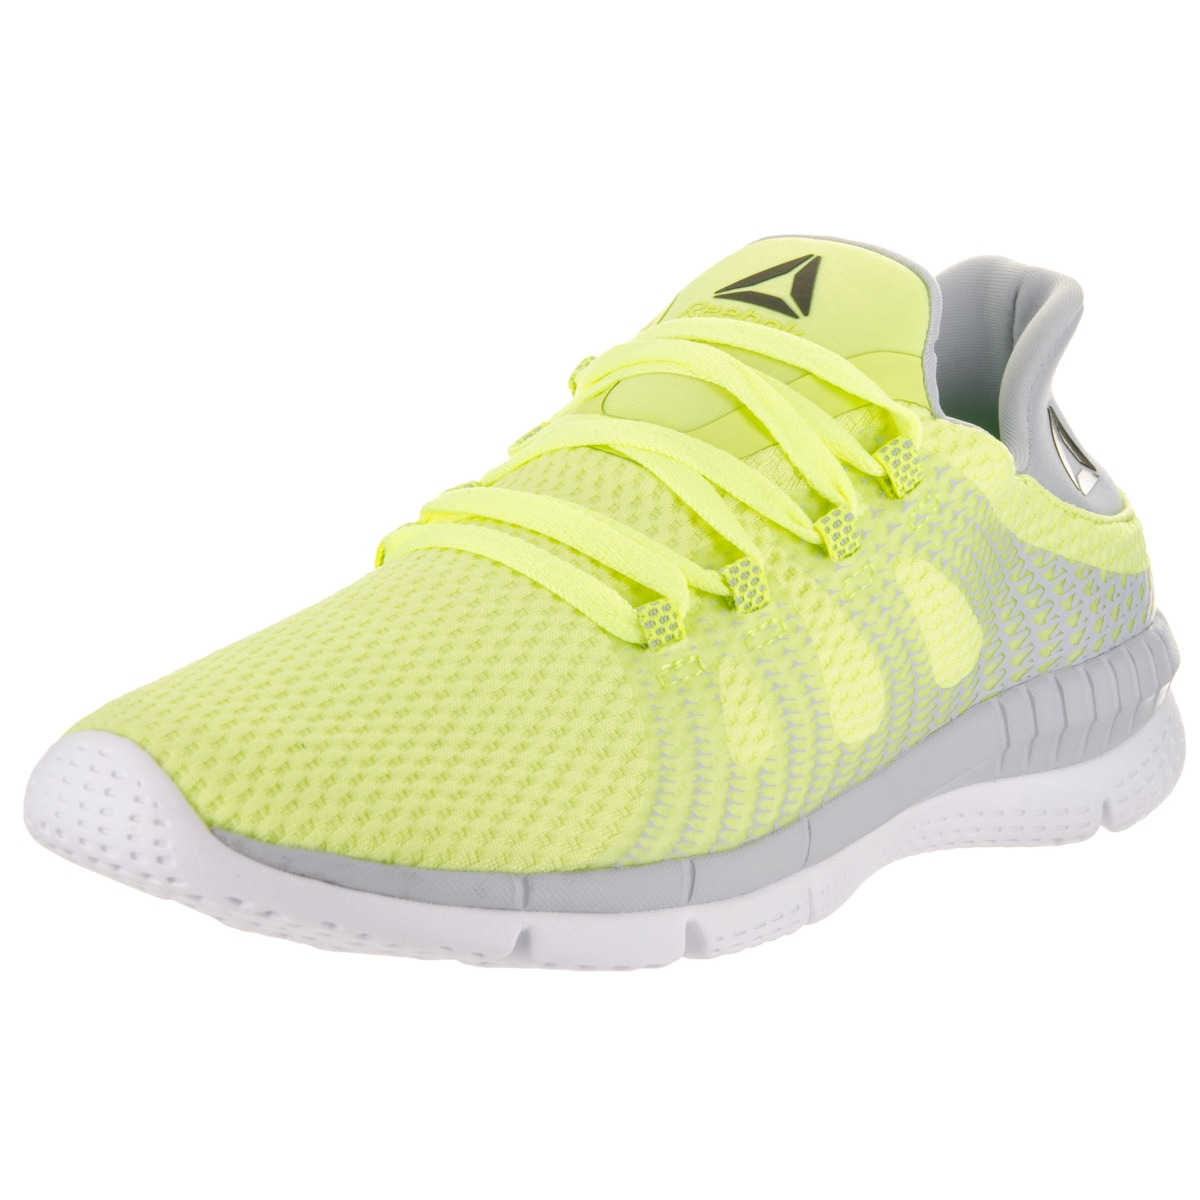 Zprint Her Mtm Running Shoe - Overstock